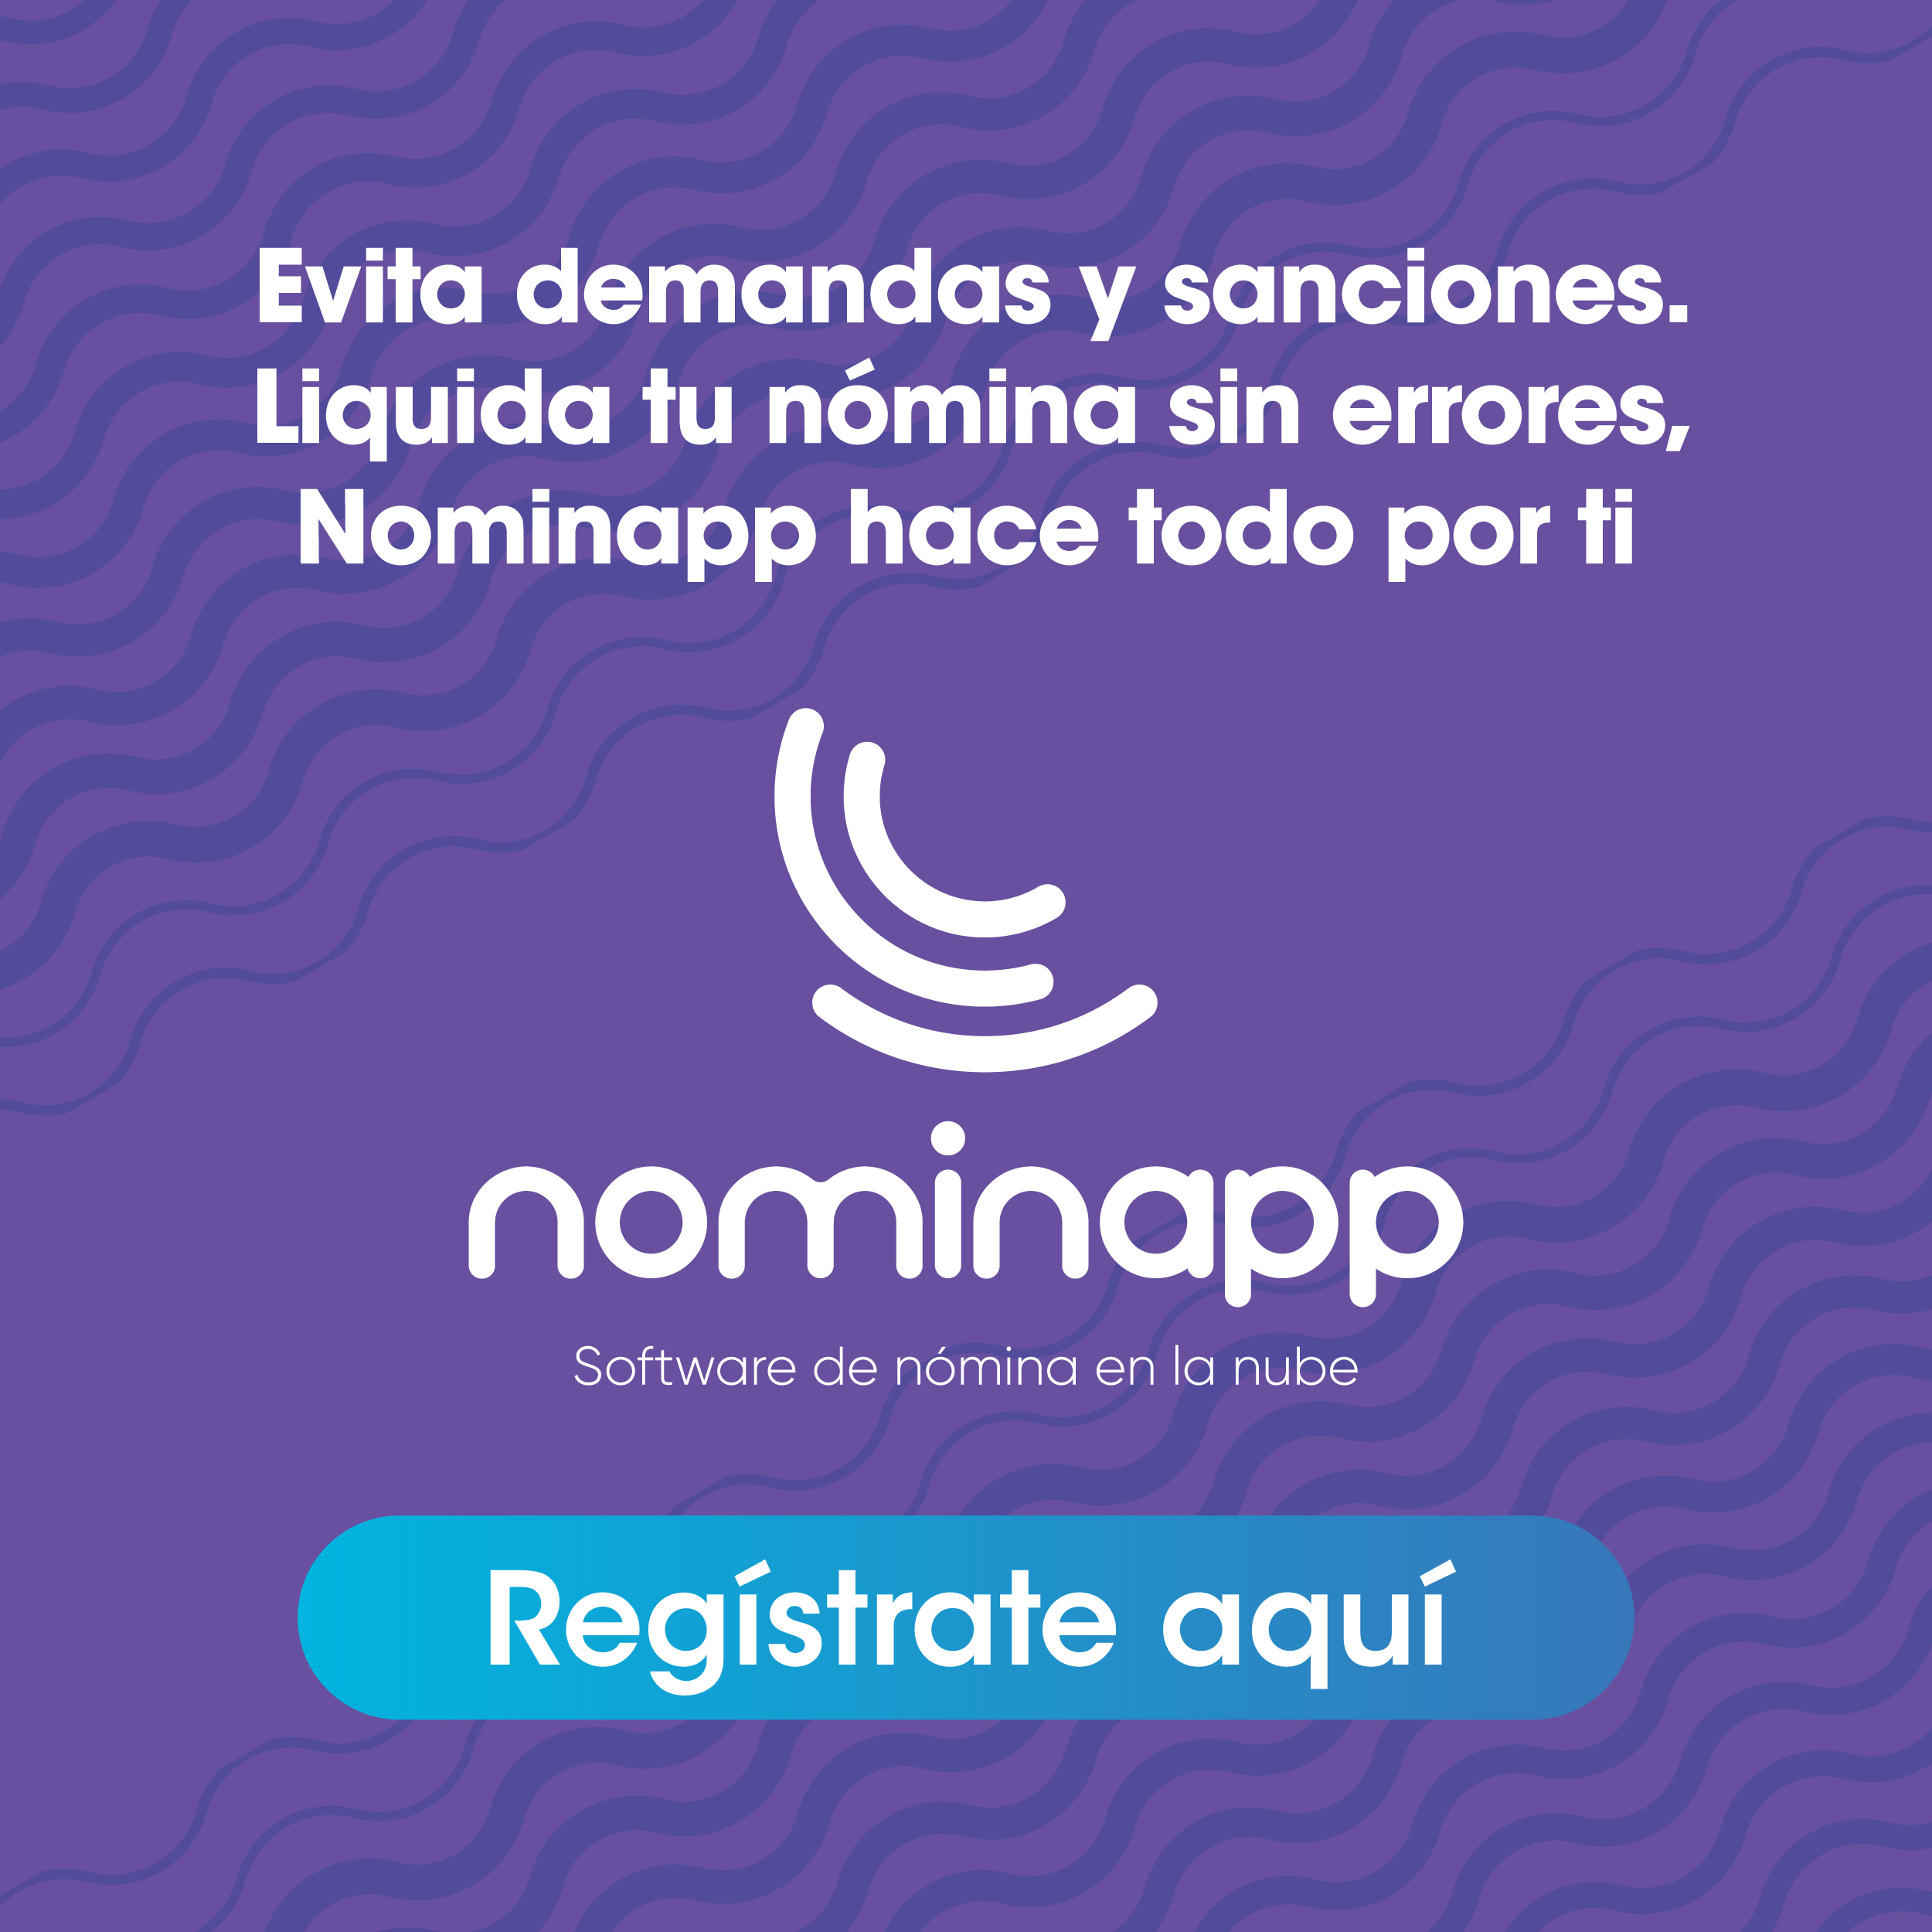 Nominapp